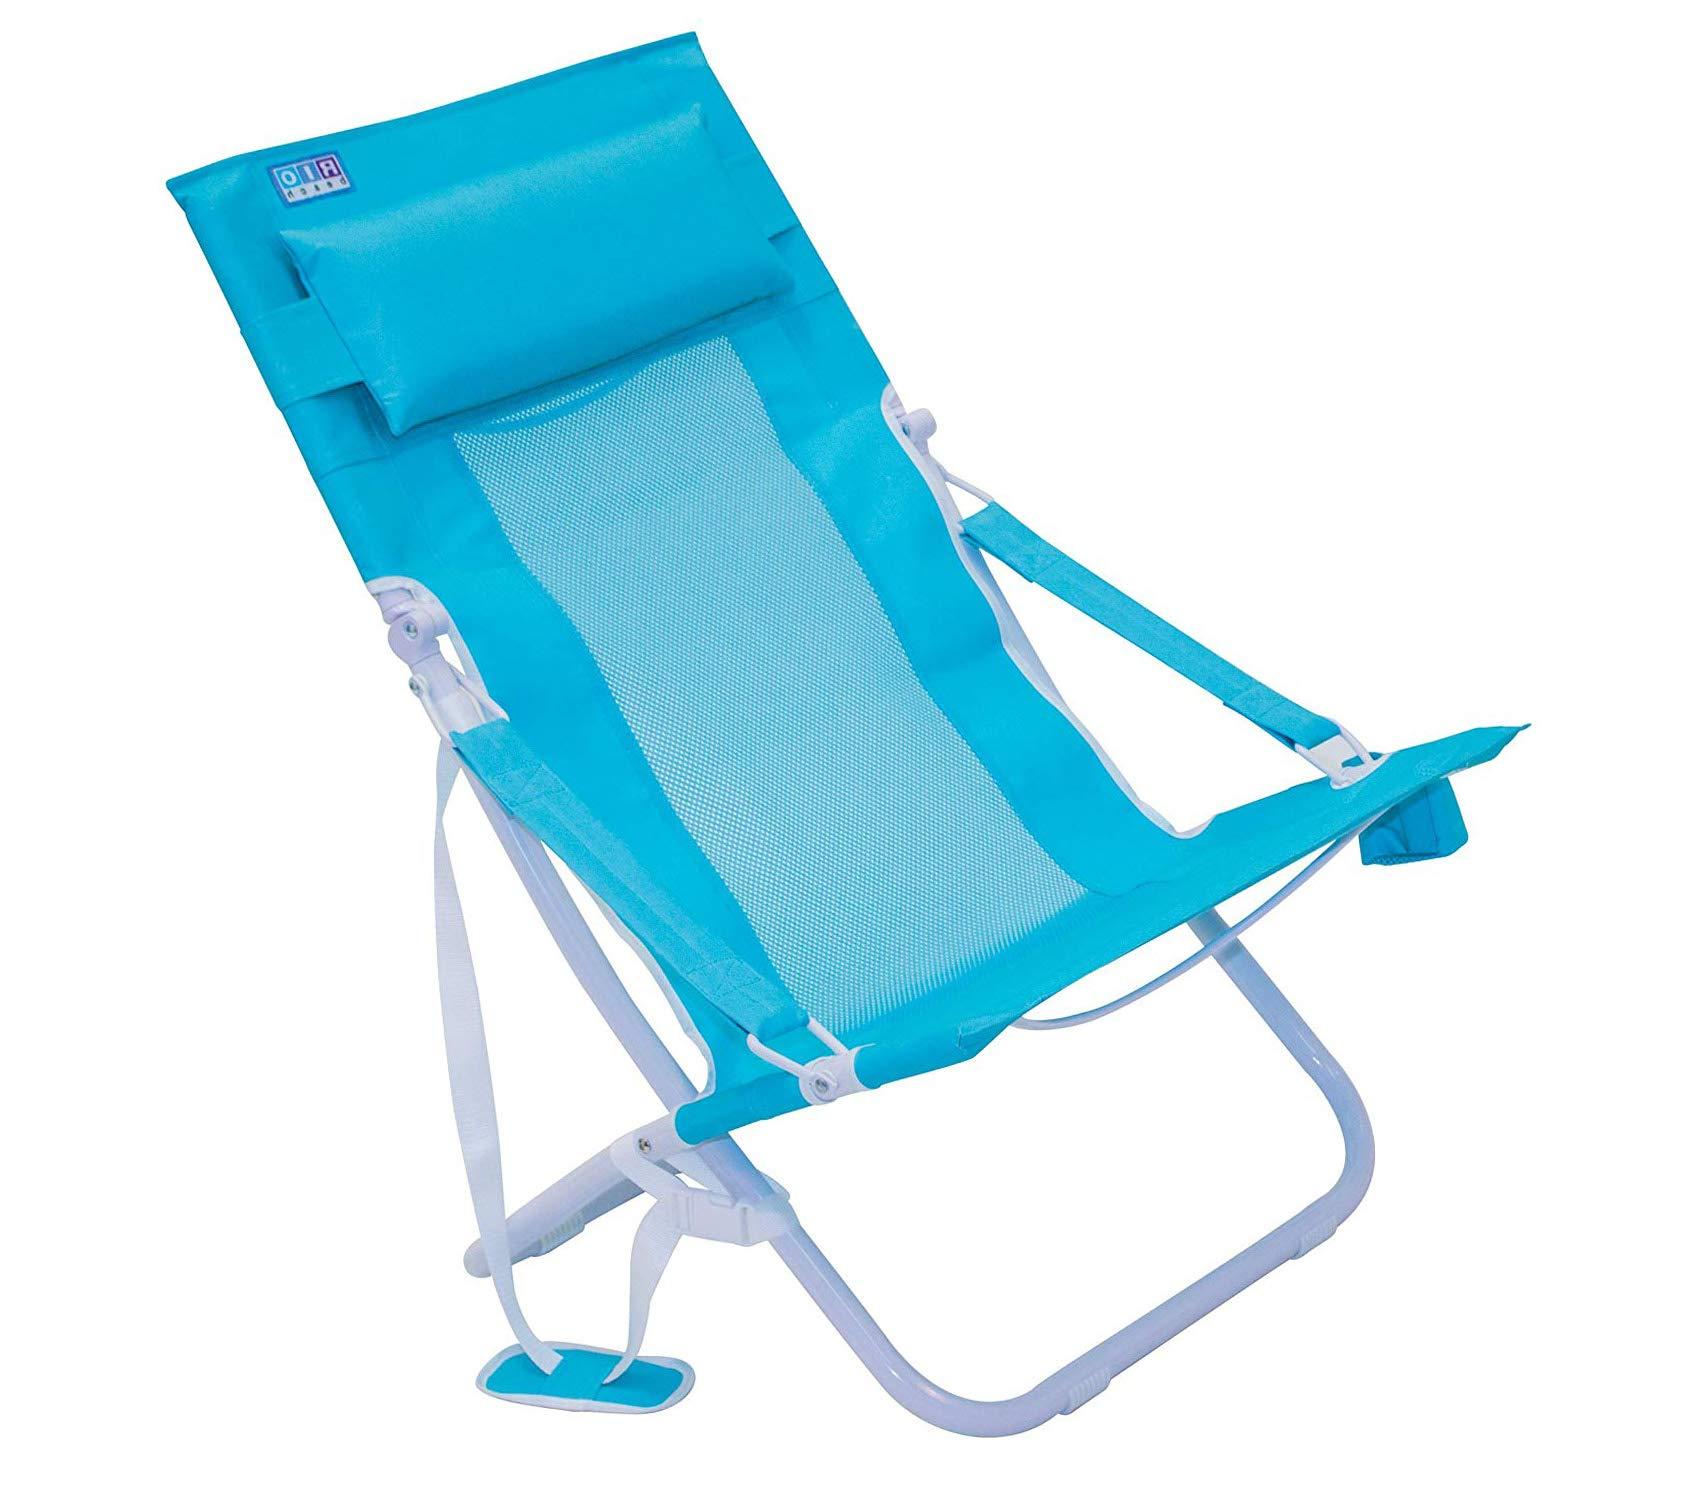 Wood & Style Patio Outdoor Garden Premium Rio Beach Portable Compact Fold Breeze Beach Sling Chair, Teal